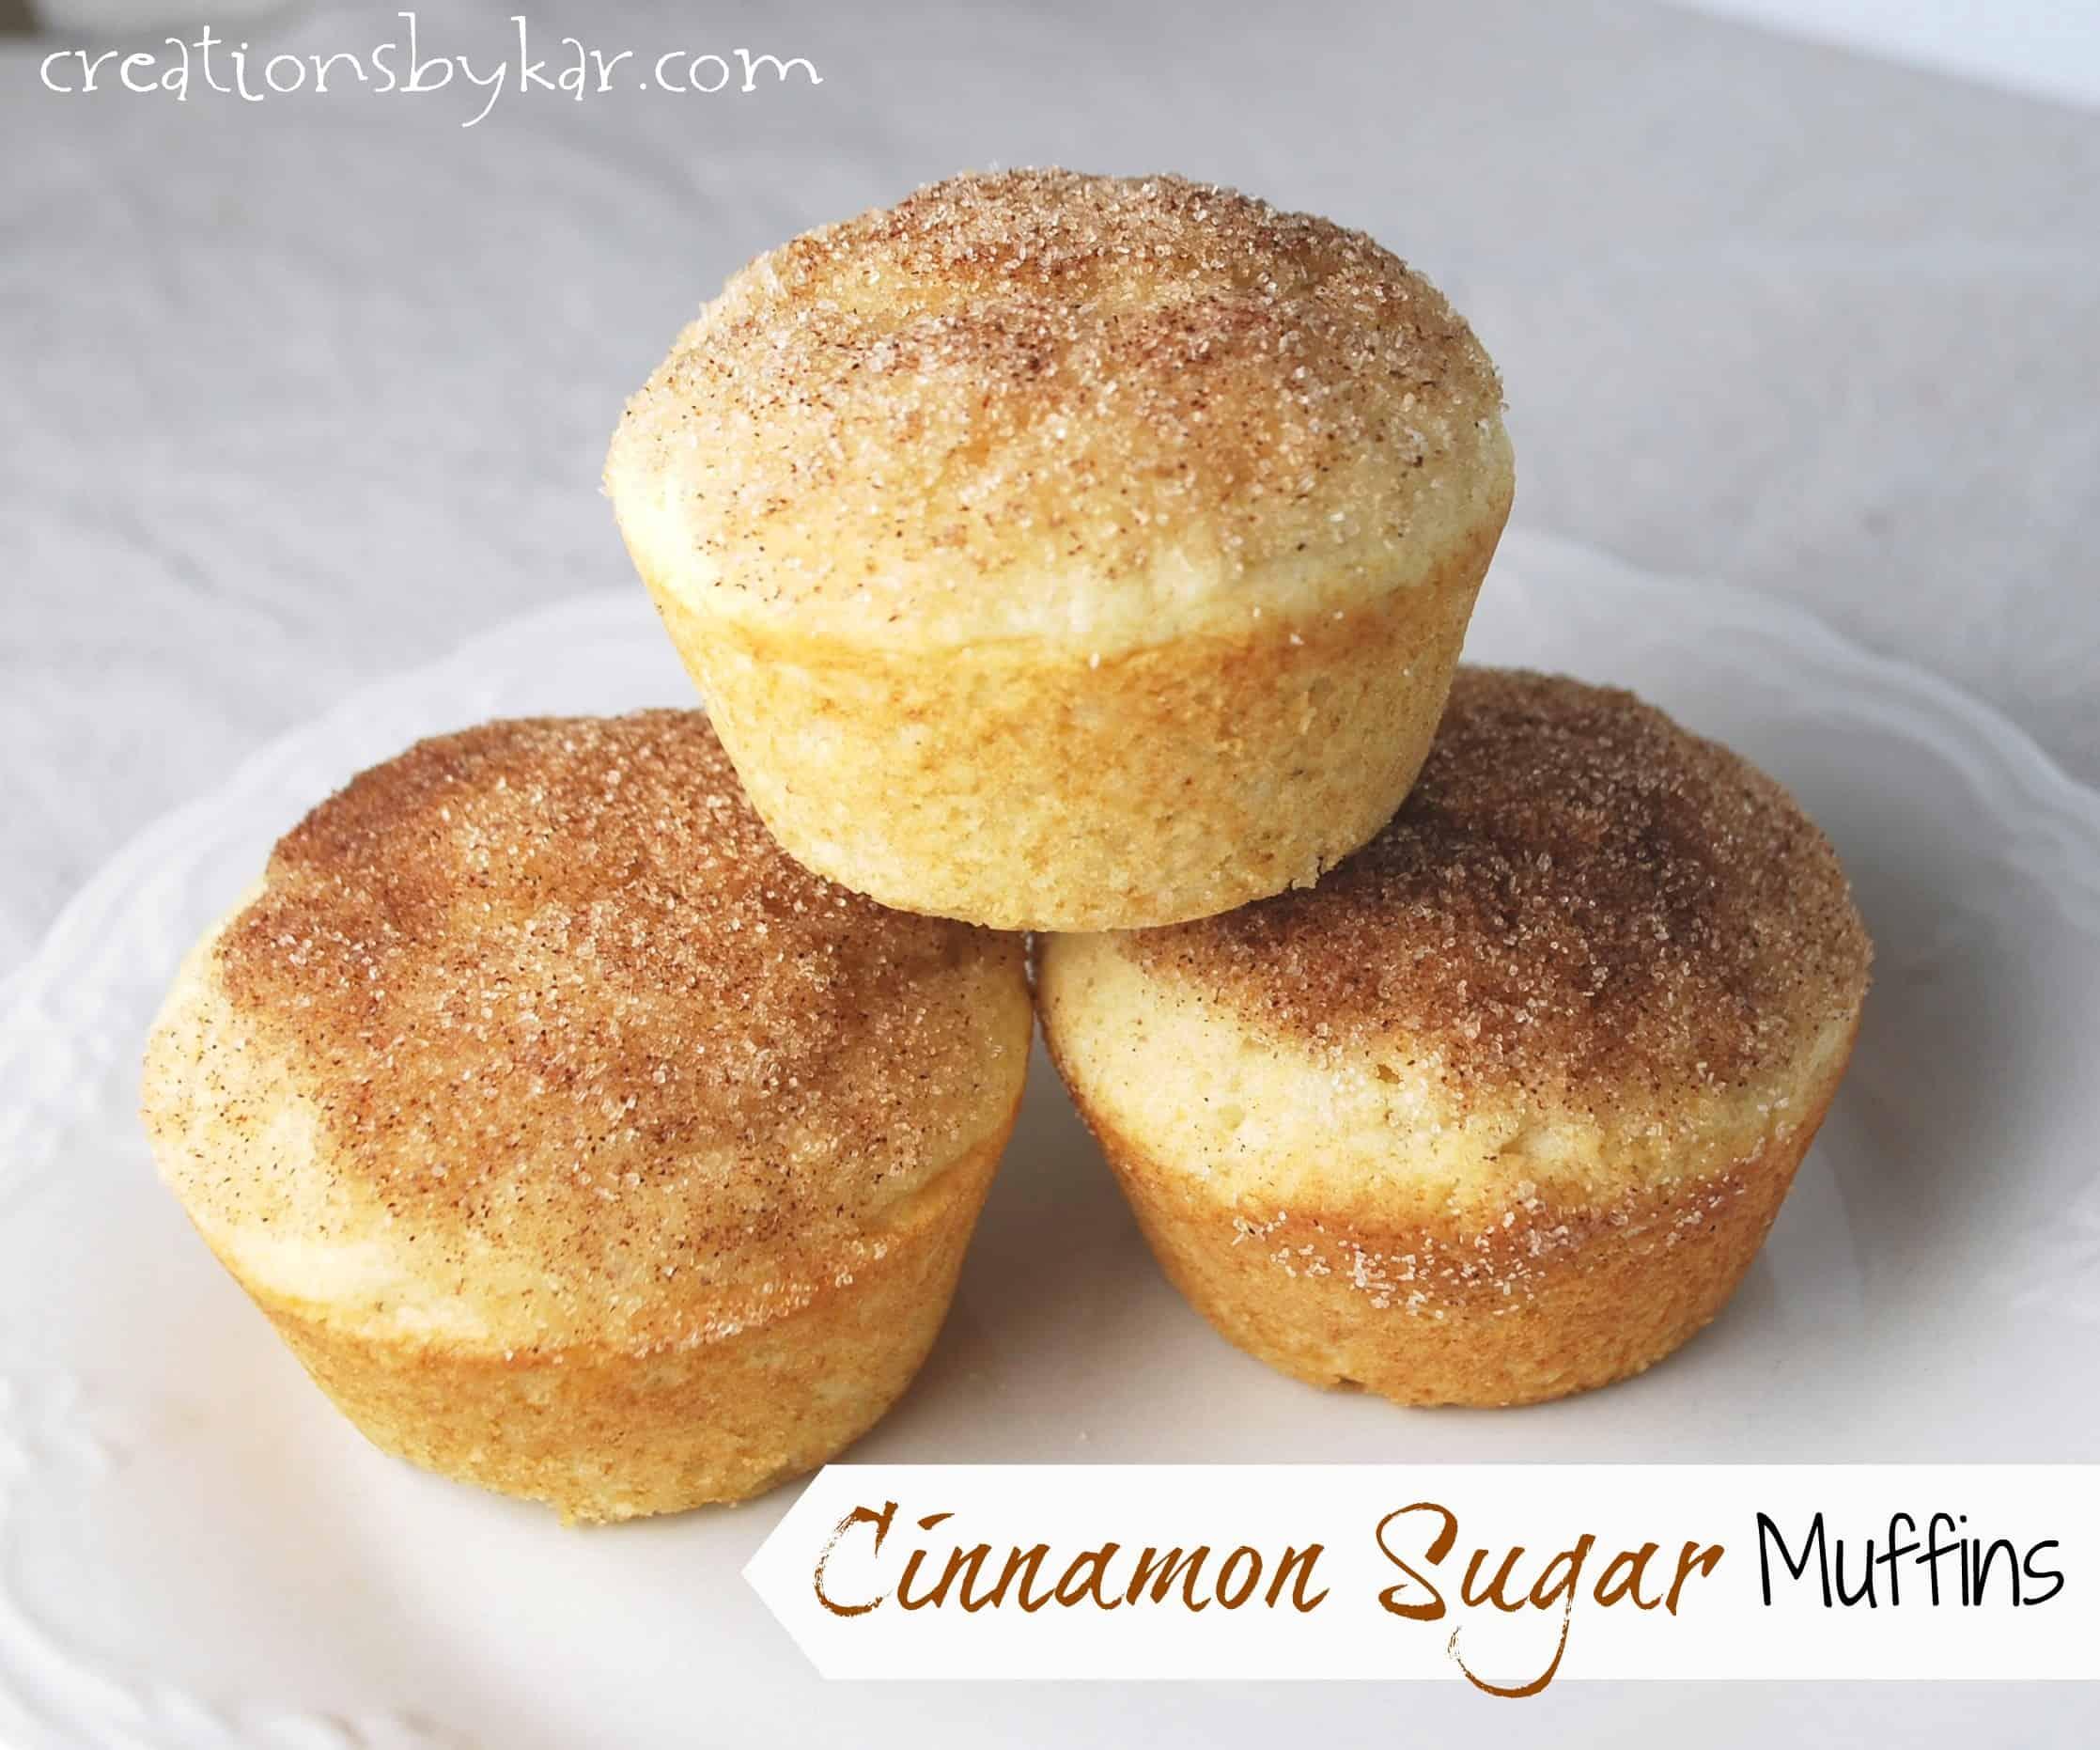 cinnamon-sugar-donut-muffins-0051.jpg